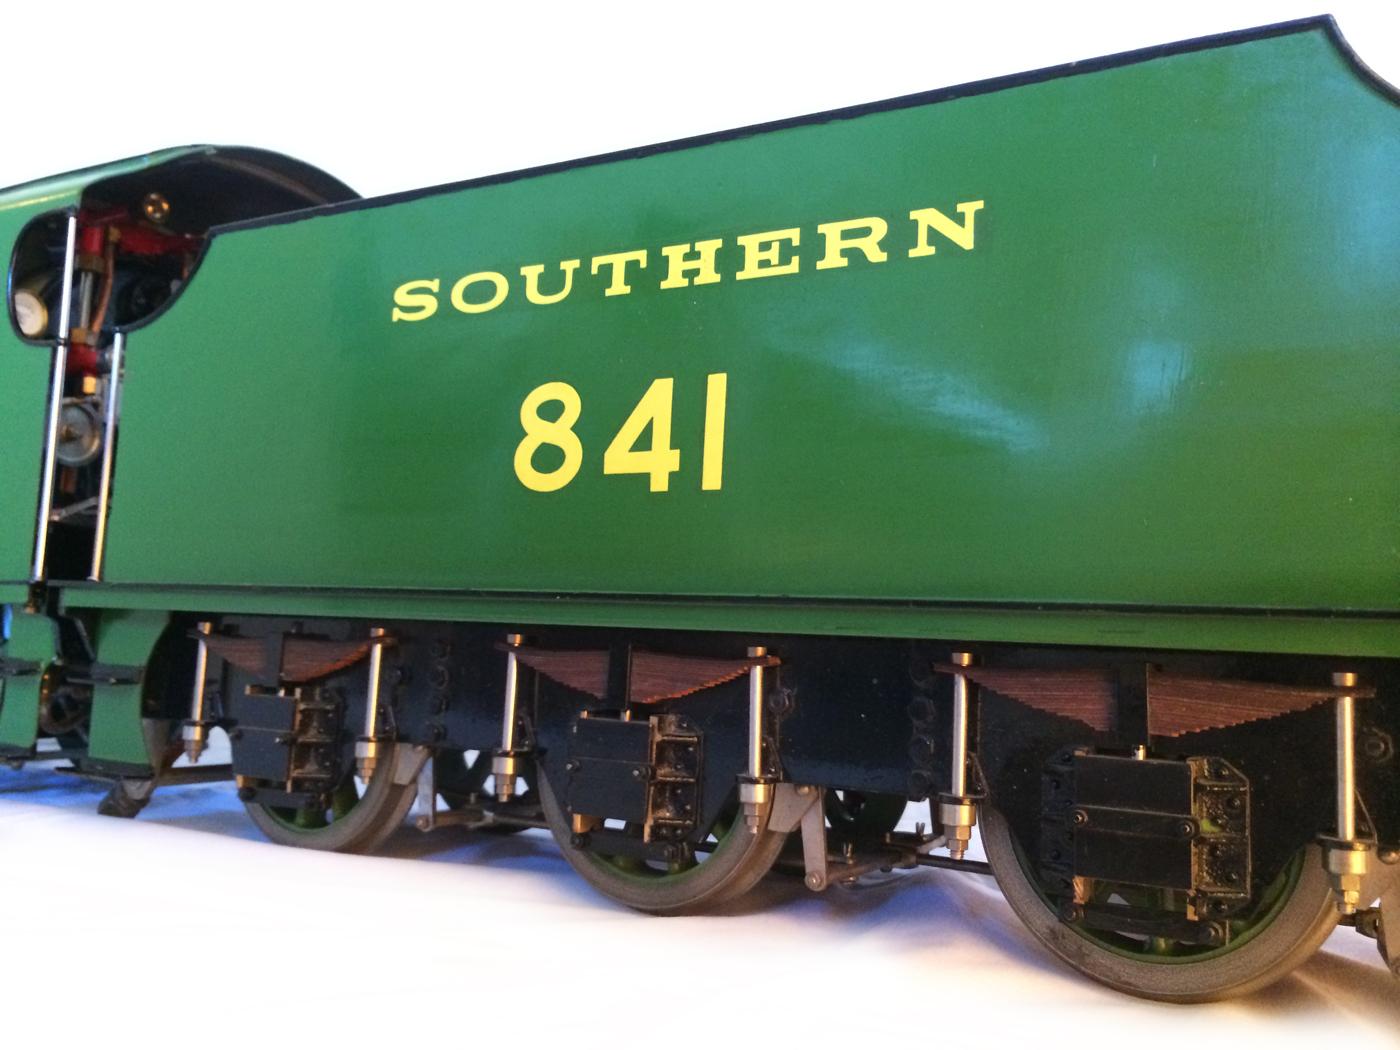 test Southern King Arthur live steam miniature locomotive for sale 08